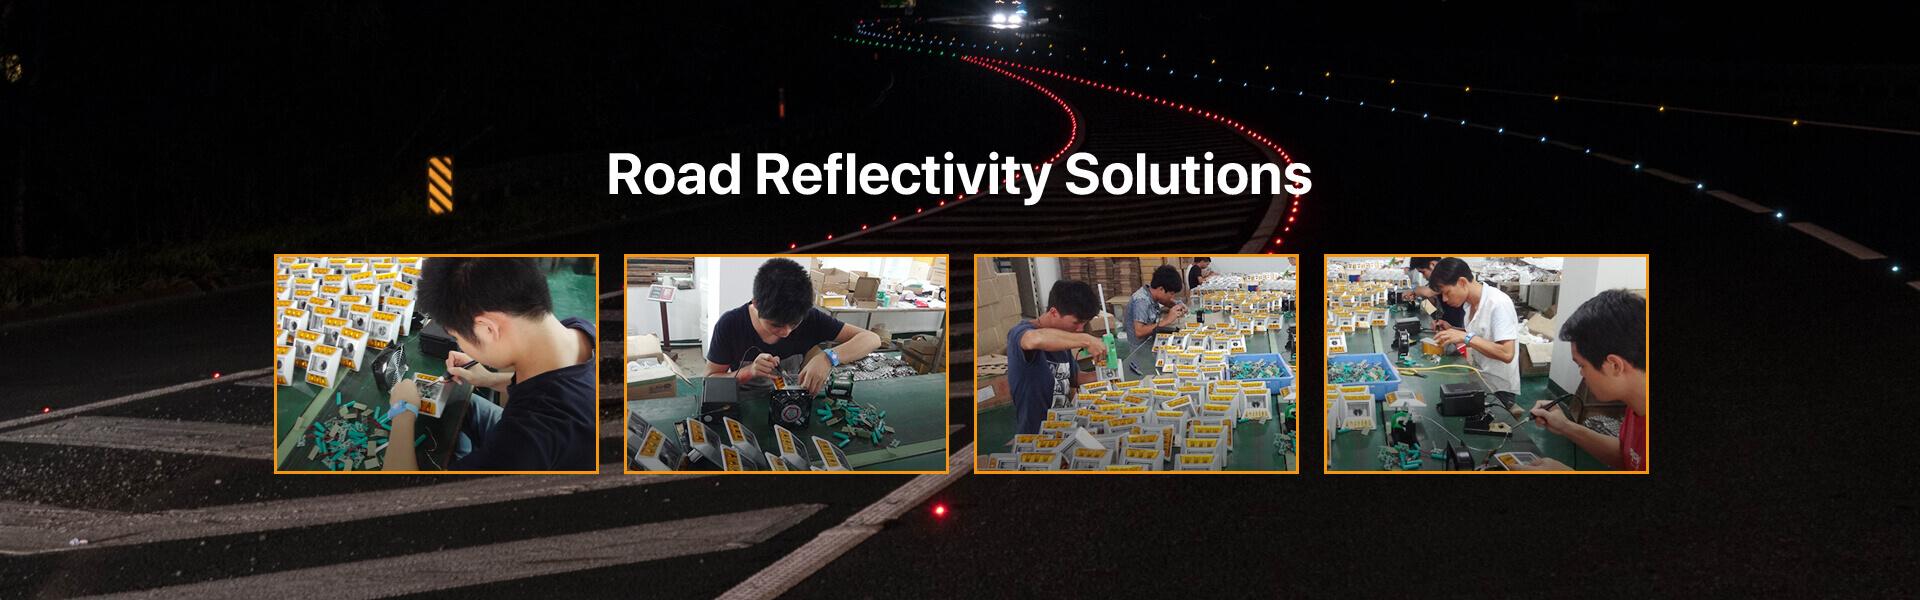 motorway reflective road studs manufacturer